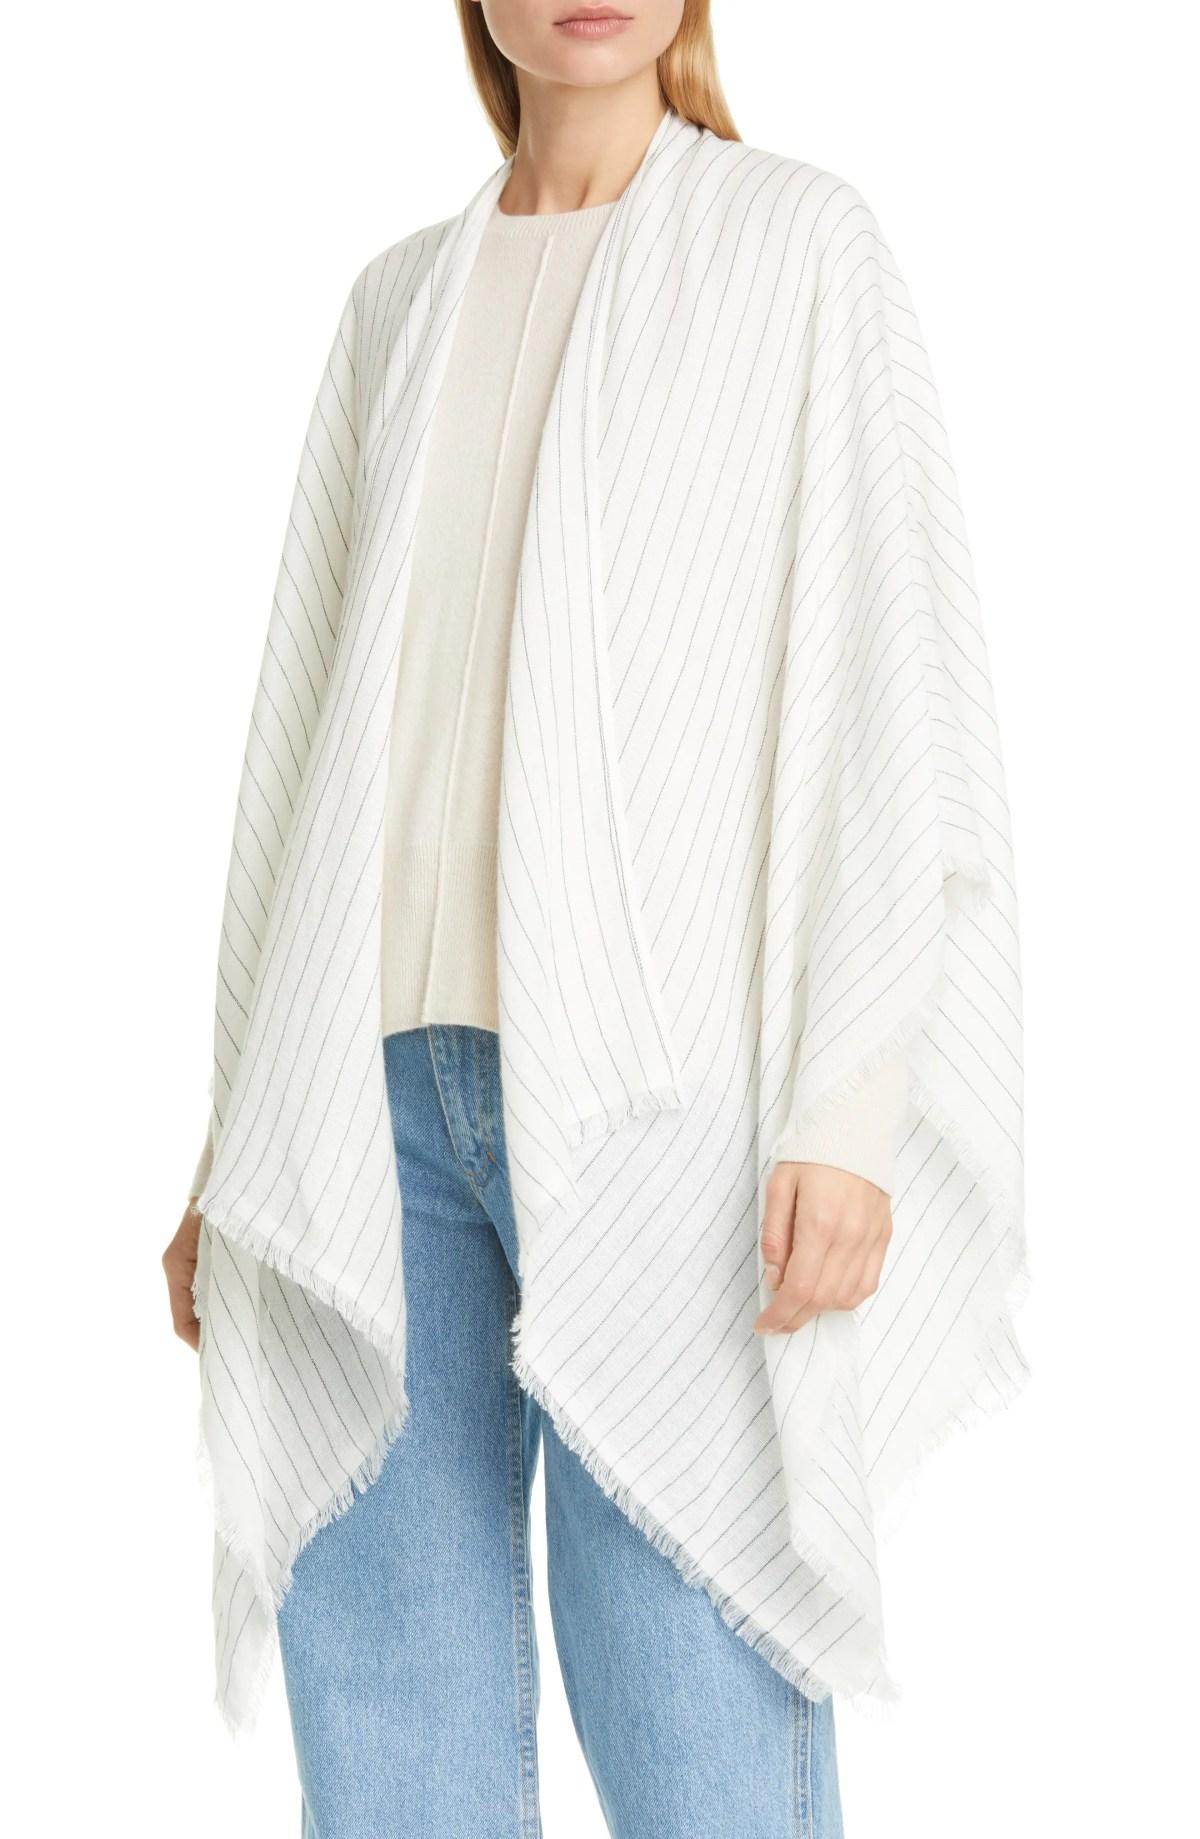 RAG & BONE Pinstripe Wrap, Main, color, WHITE